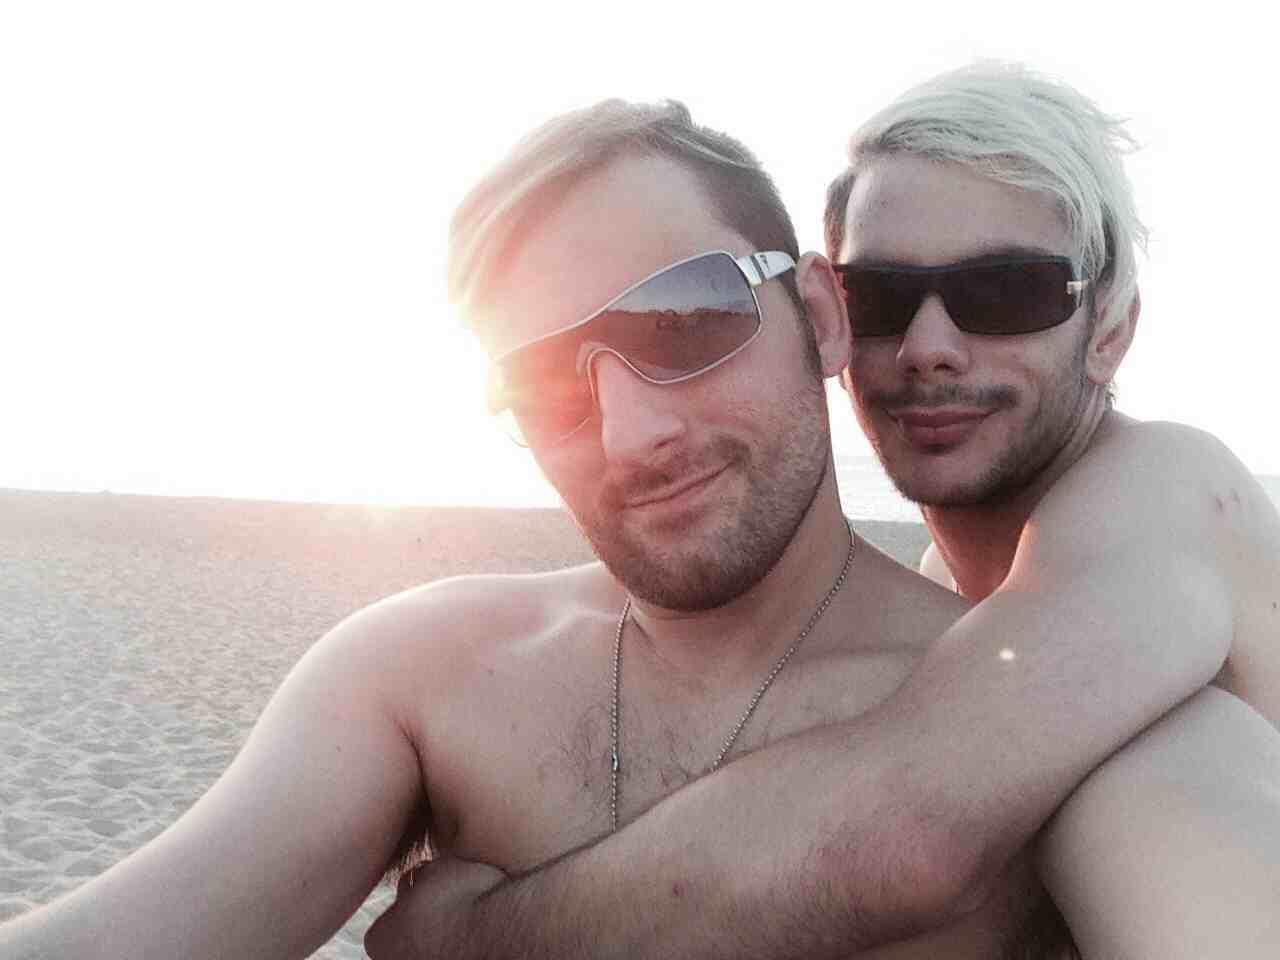 gayboyinlove22